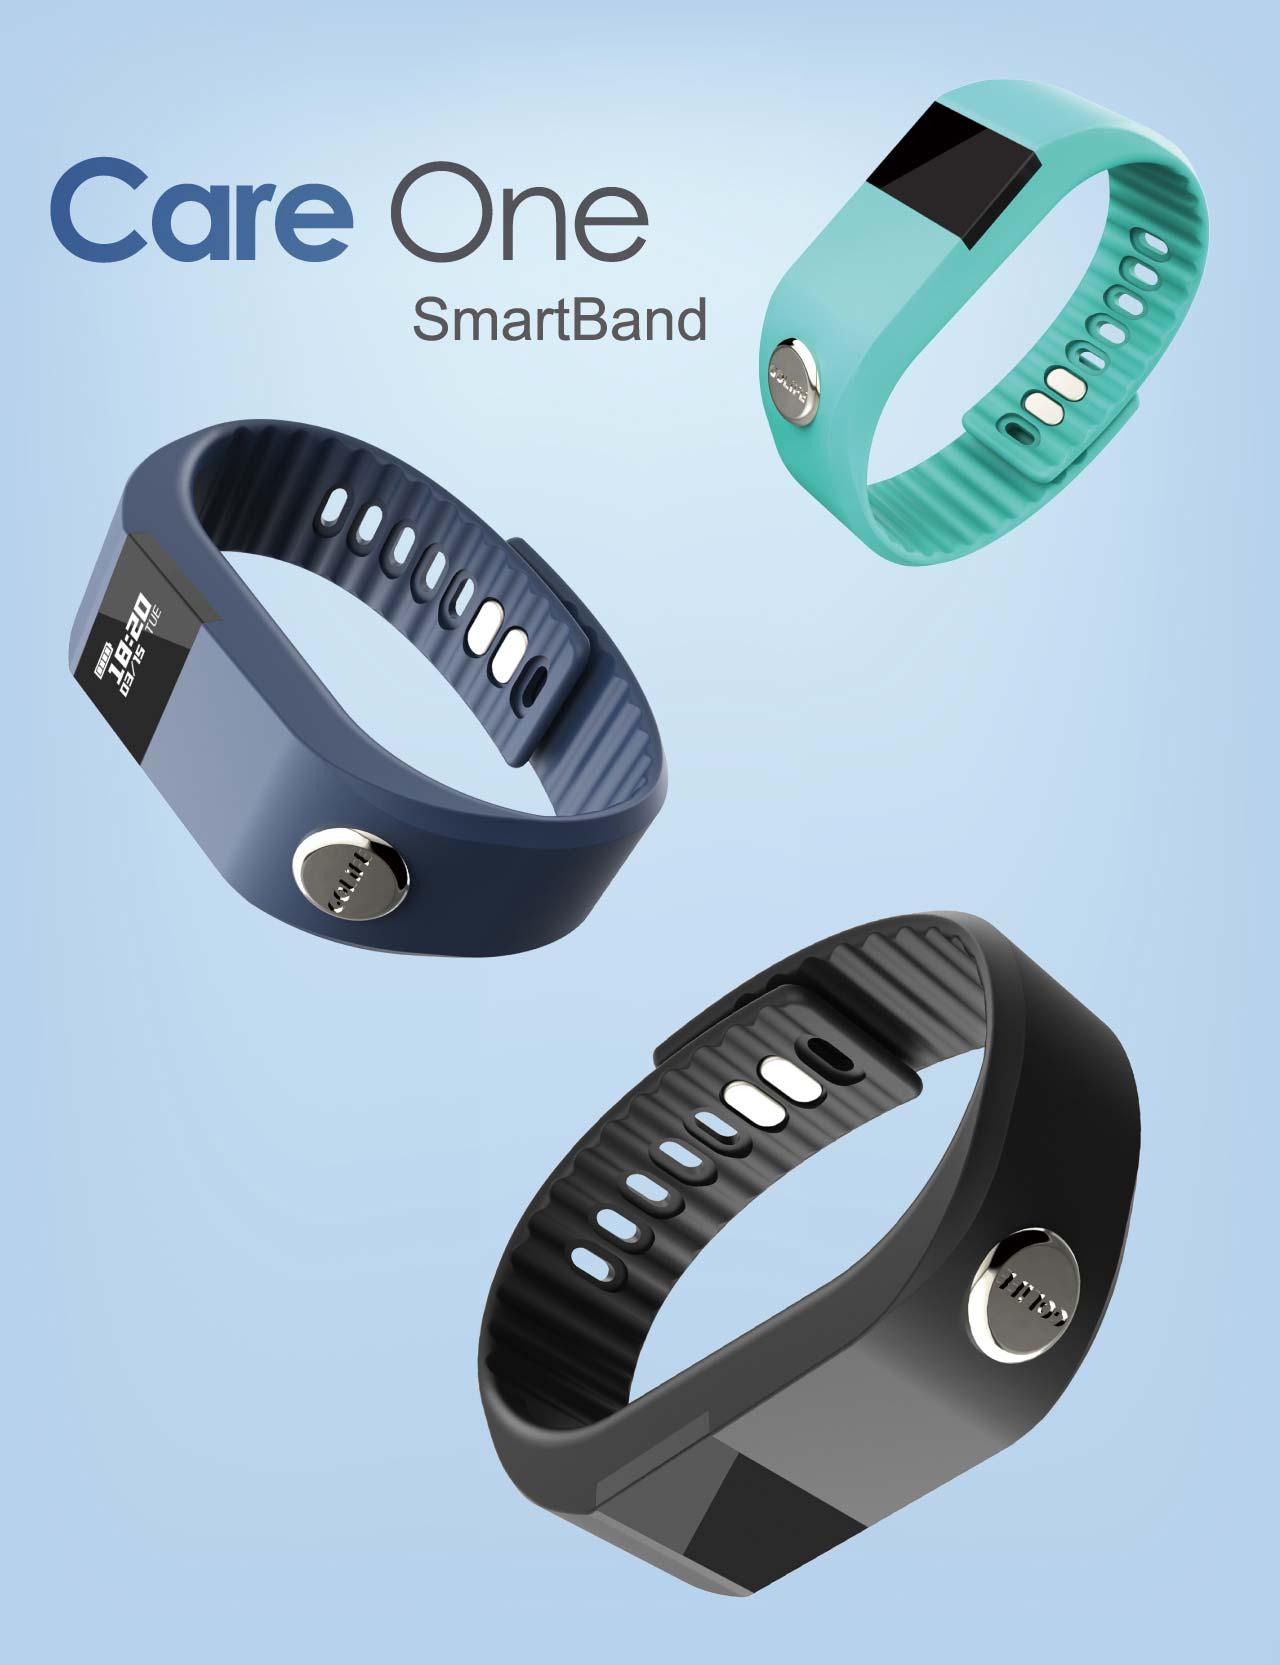 GOLiFE Care One SmartBand